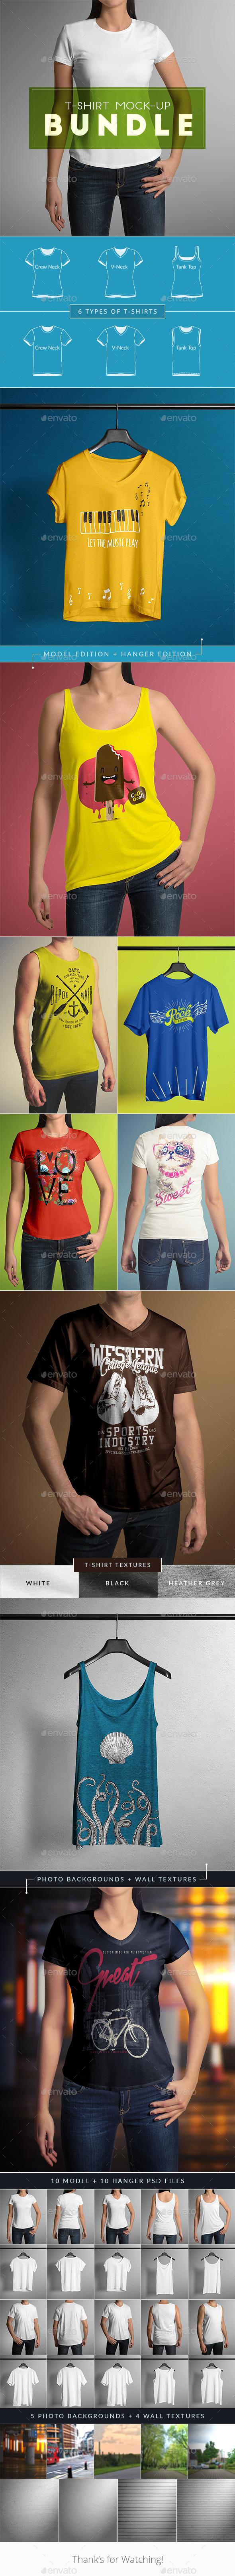 GraphicRiver T-Shirt Mock-Up Bundle 11395994